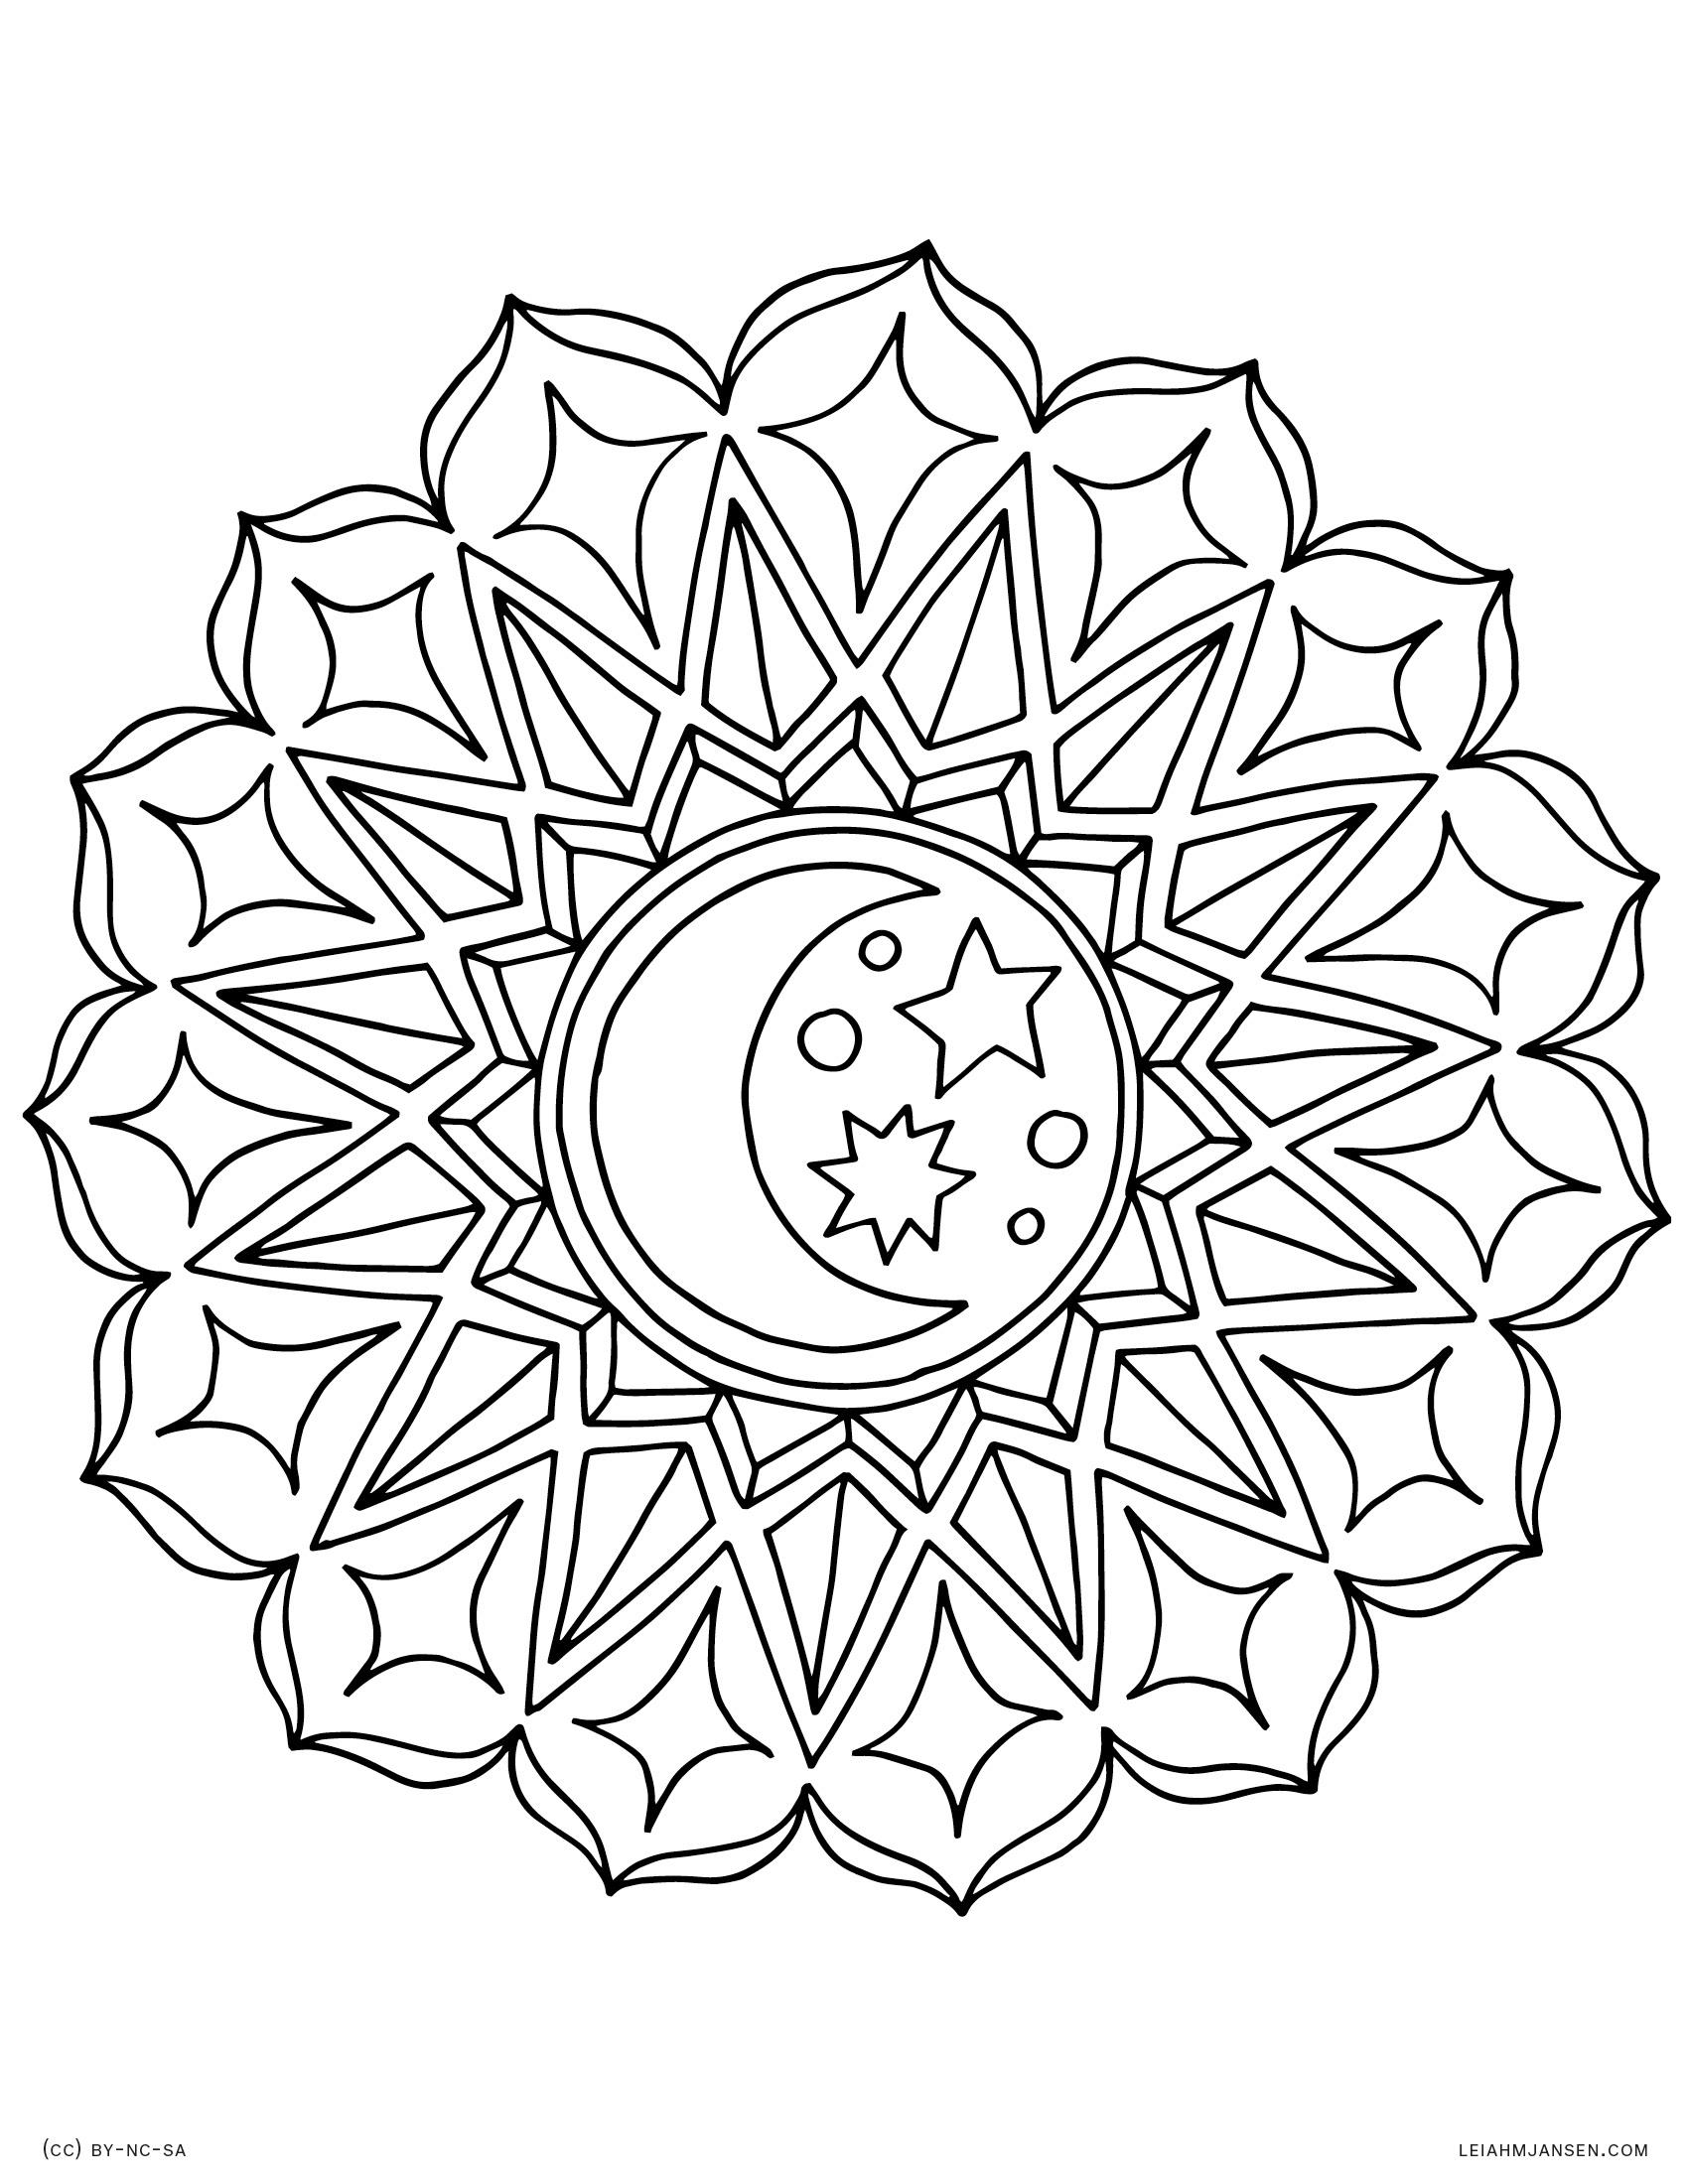 Mandalas Drawing At Getdrawings